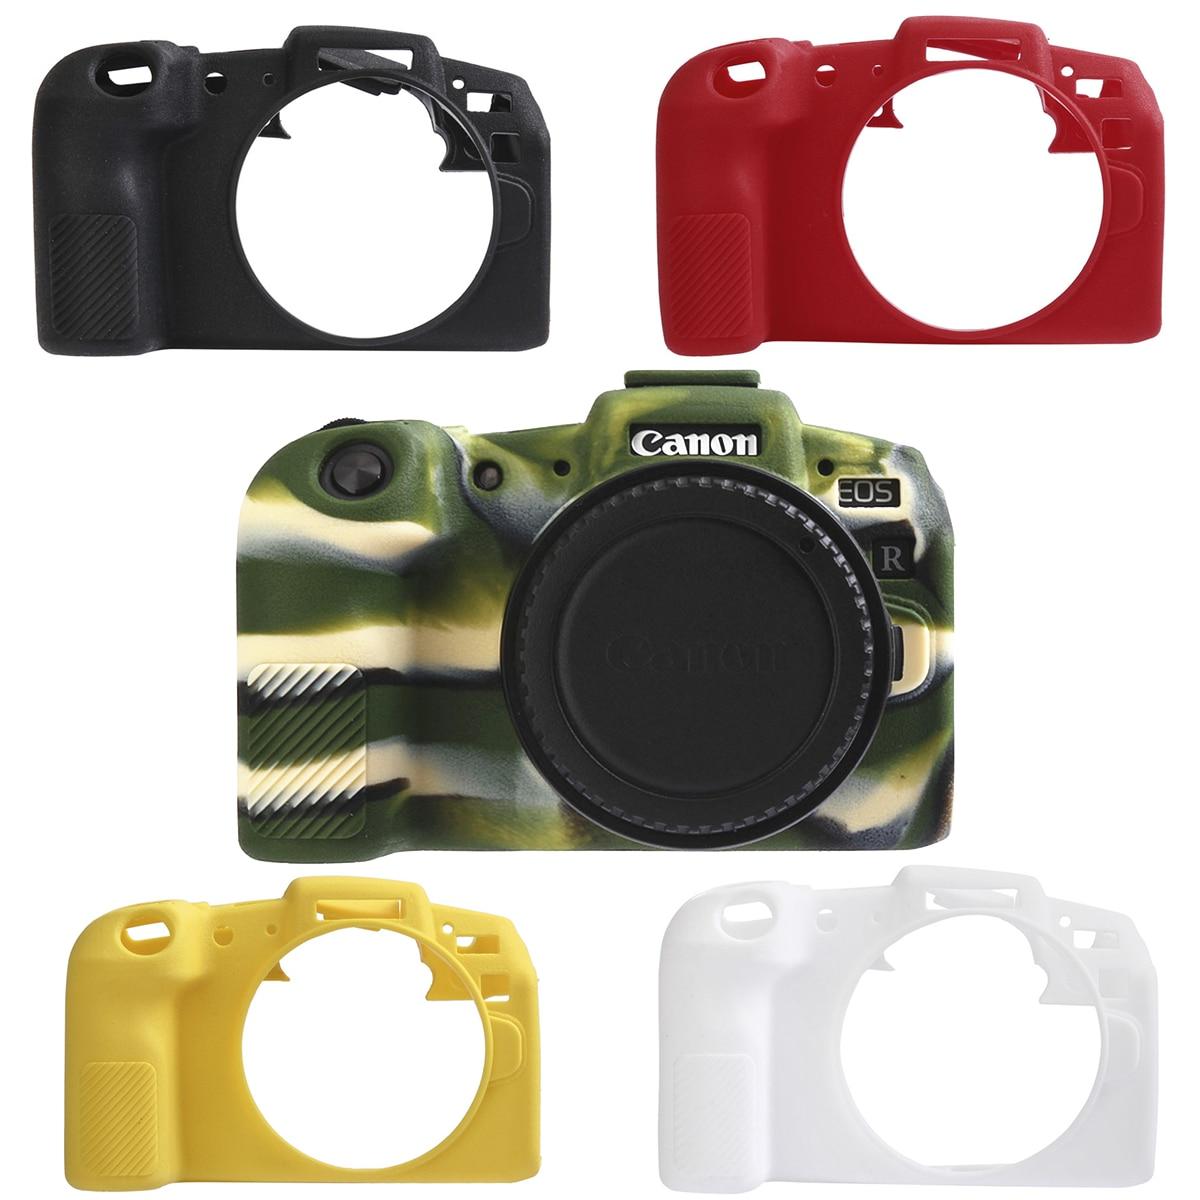 Lente de la c/ámara Tapa Protectora Cubierta de la Lente Tapa Frontal 49 52 55 58 62 67 72 77 mm para Canon Nikon Pentax DSLR Lens